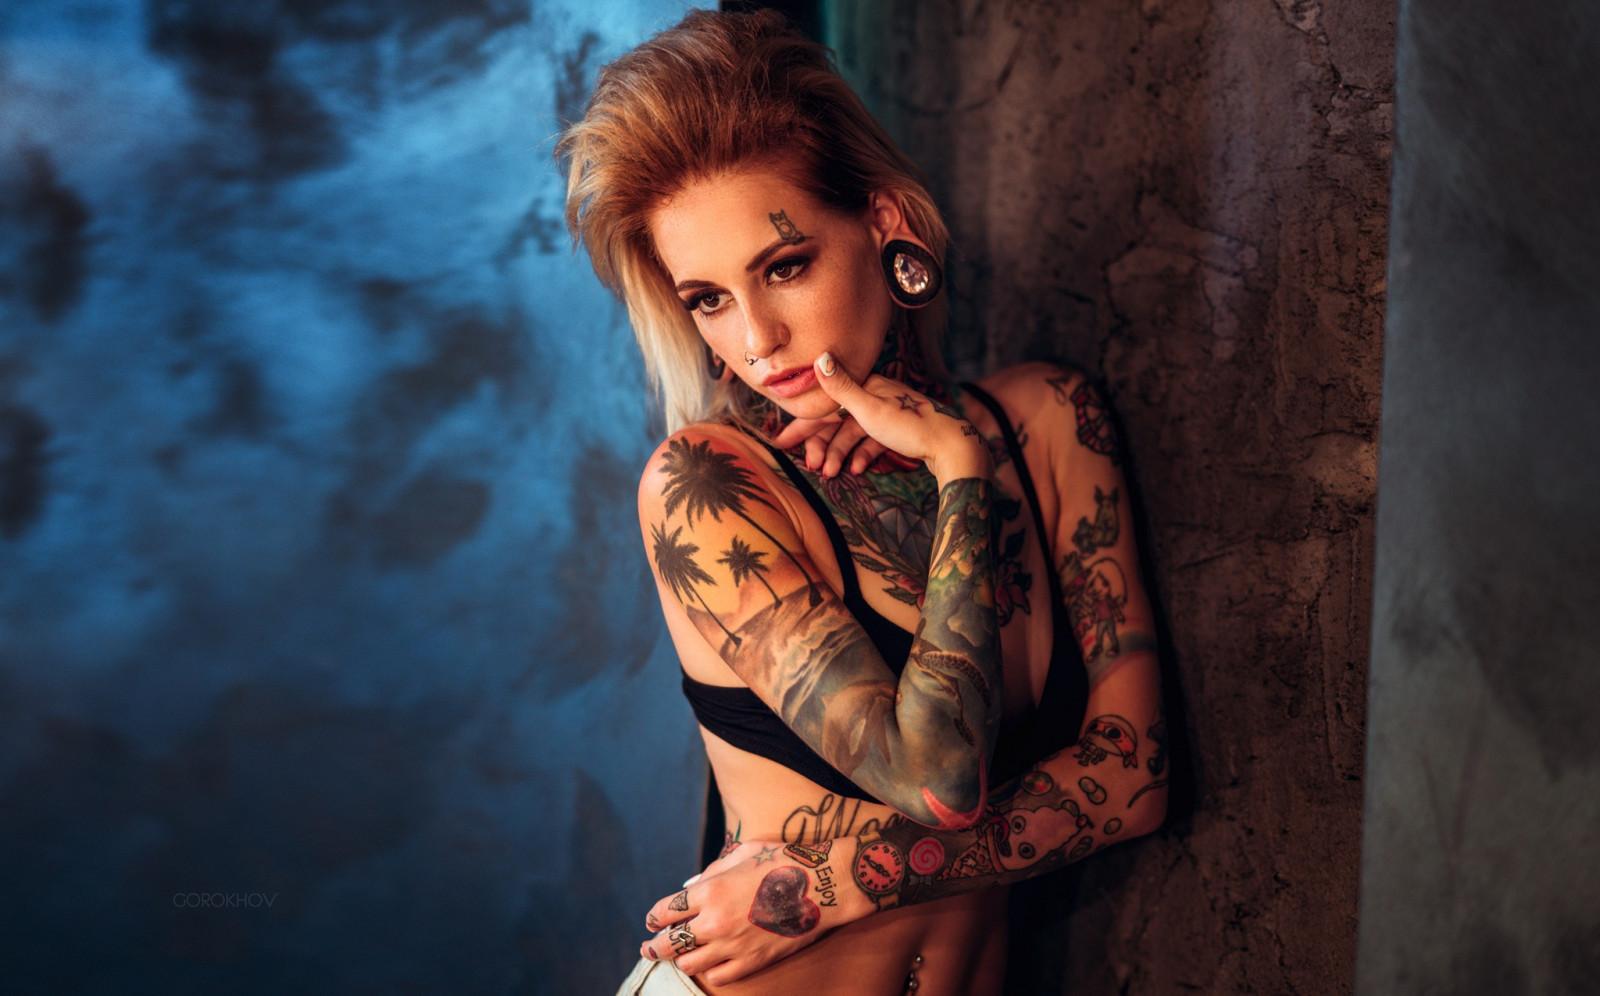 Girl Eyes Looking Up Wallpaper Wallpaper Face Women Blonde Looking Away Tattoo Bra